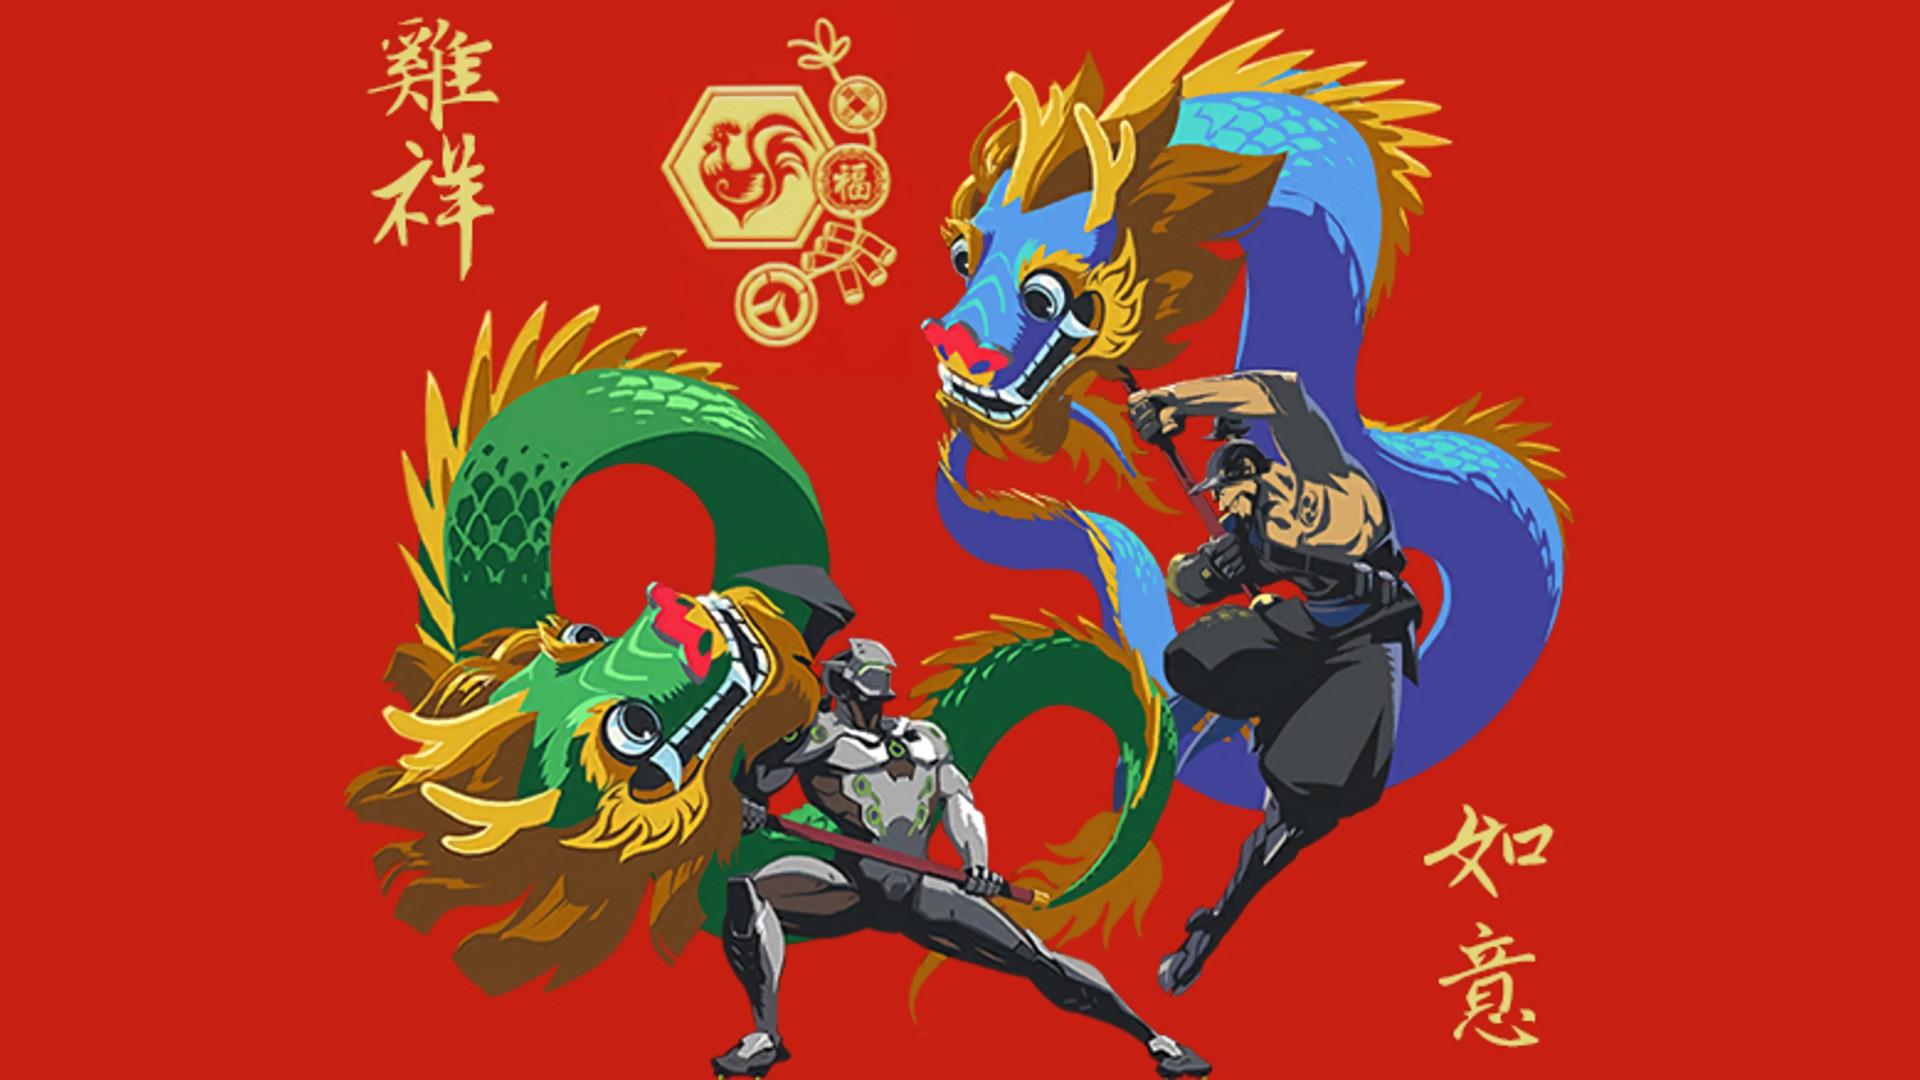 Genji Overwatch Wallpaper Download Free Beautiful Full